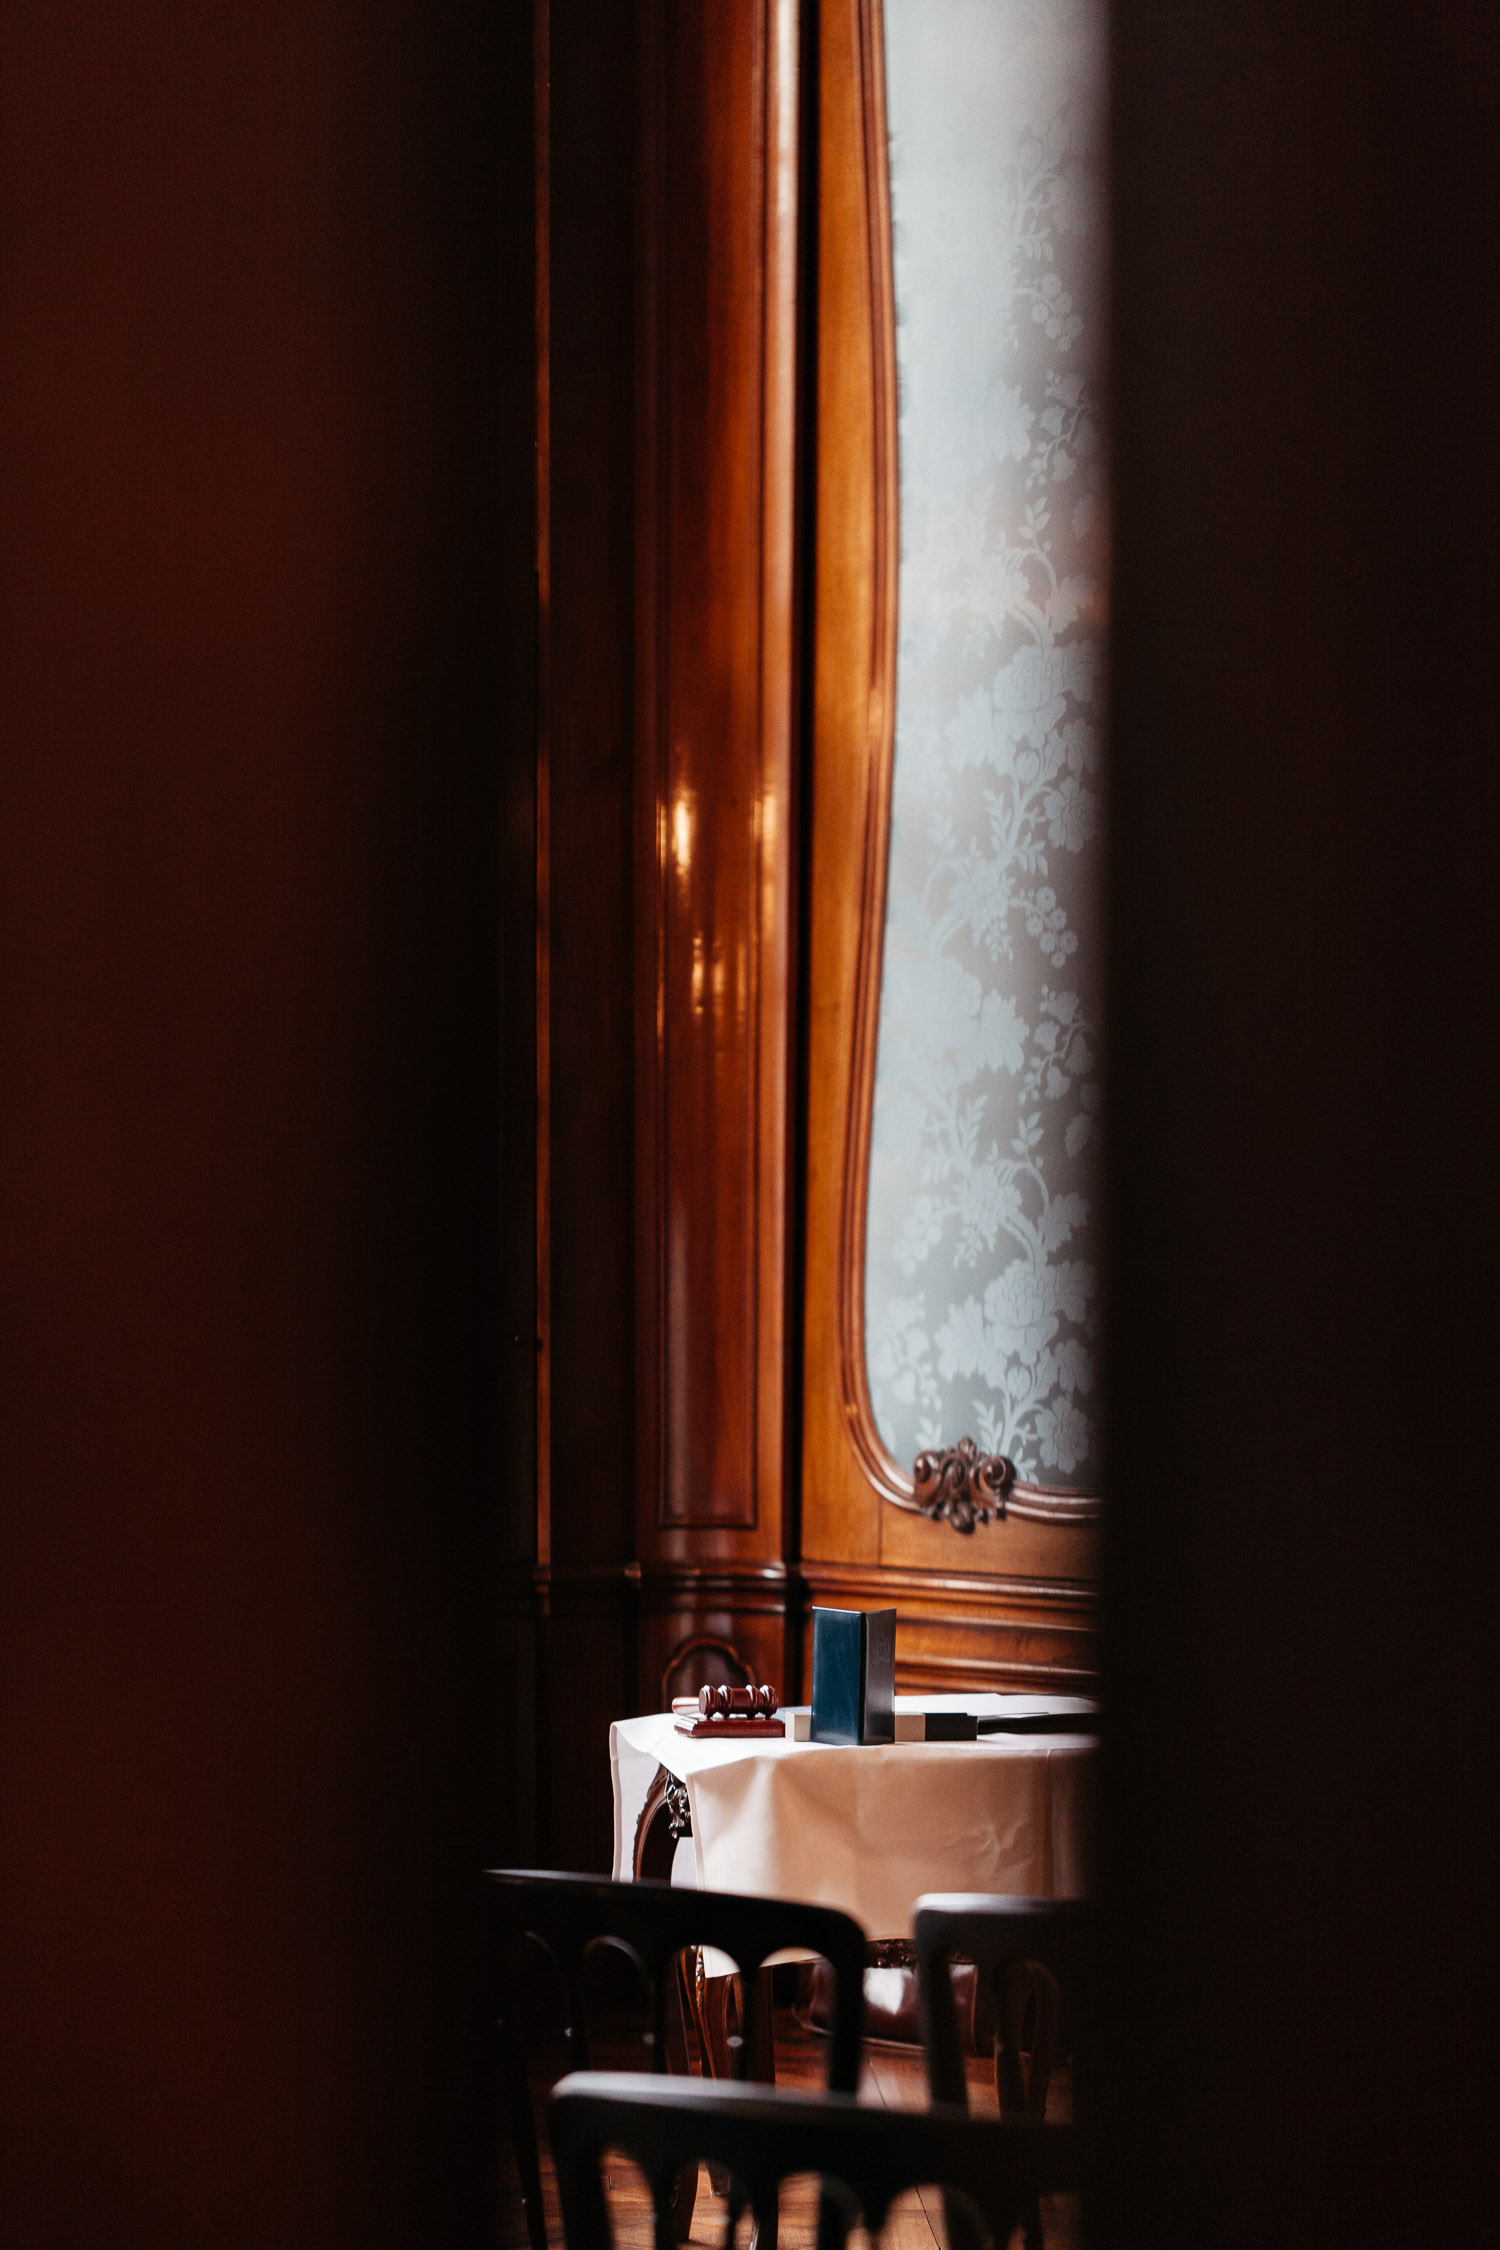 Wedding-Stephen-and-Mischa-Huis-Bartolotti-photography-by-On-a-hazy-morning-Amsterdam-121.jpg